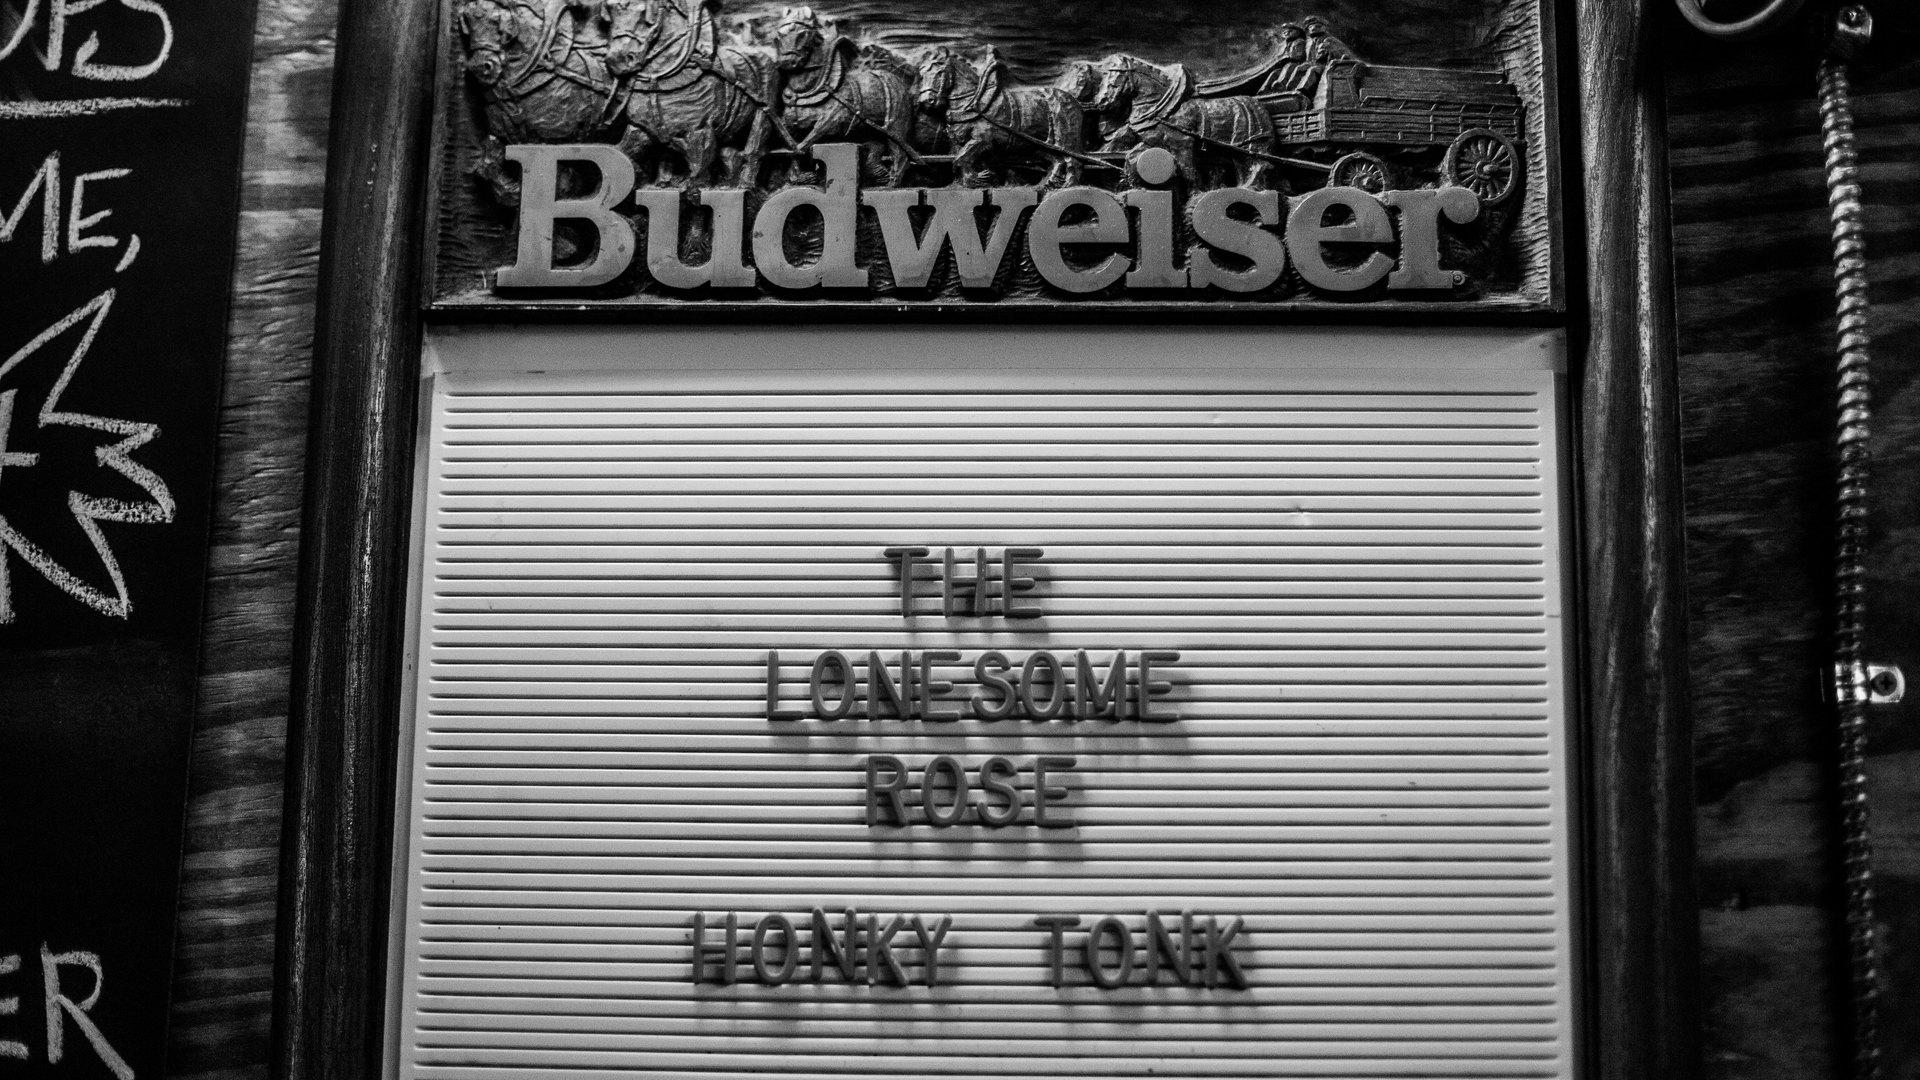 lonesome rose-lonesome rose-0030.jpg